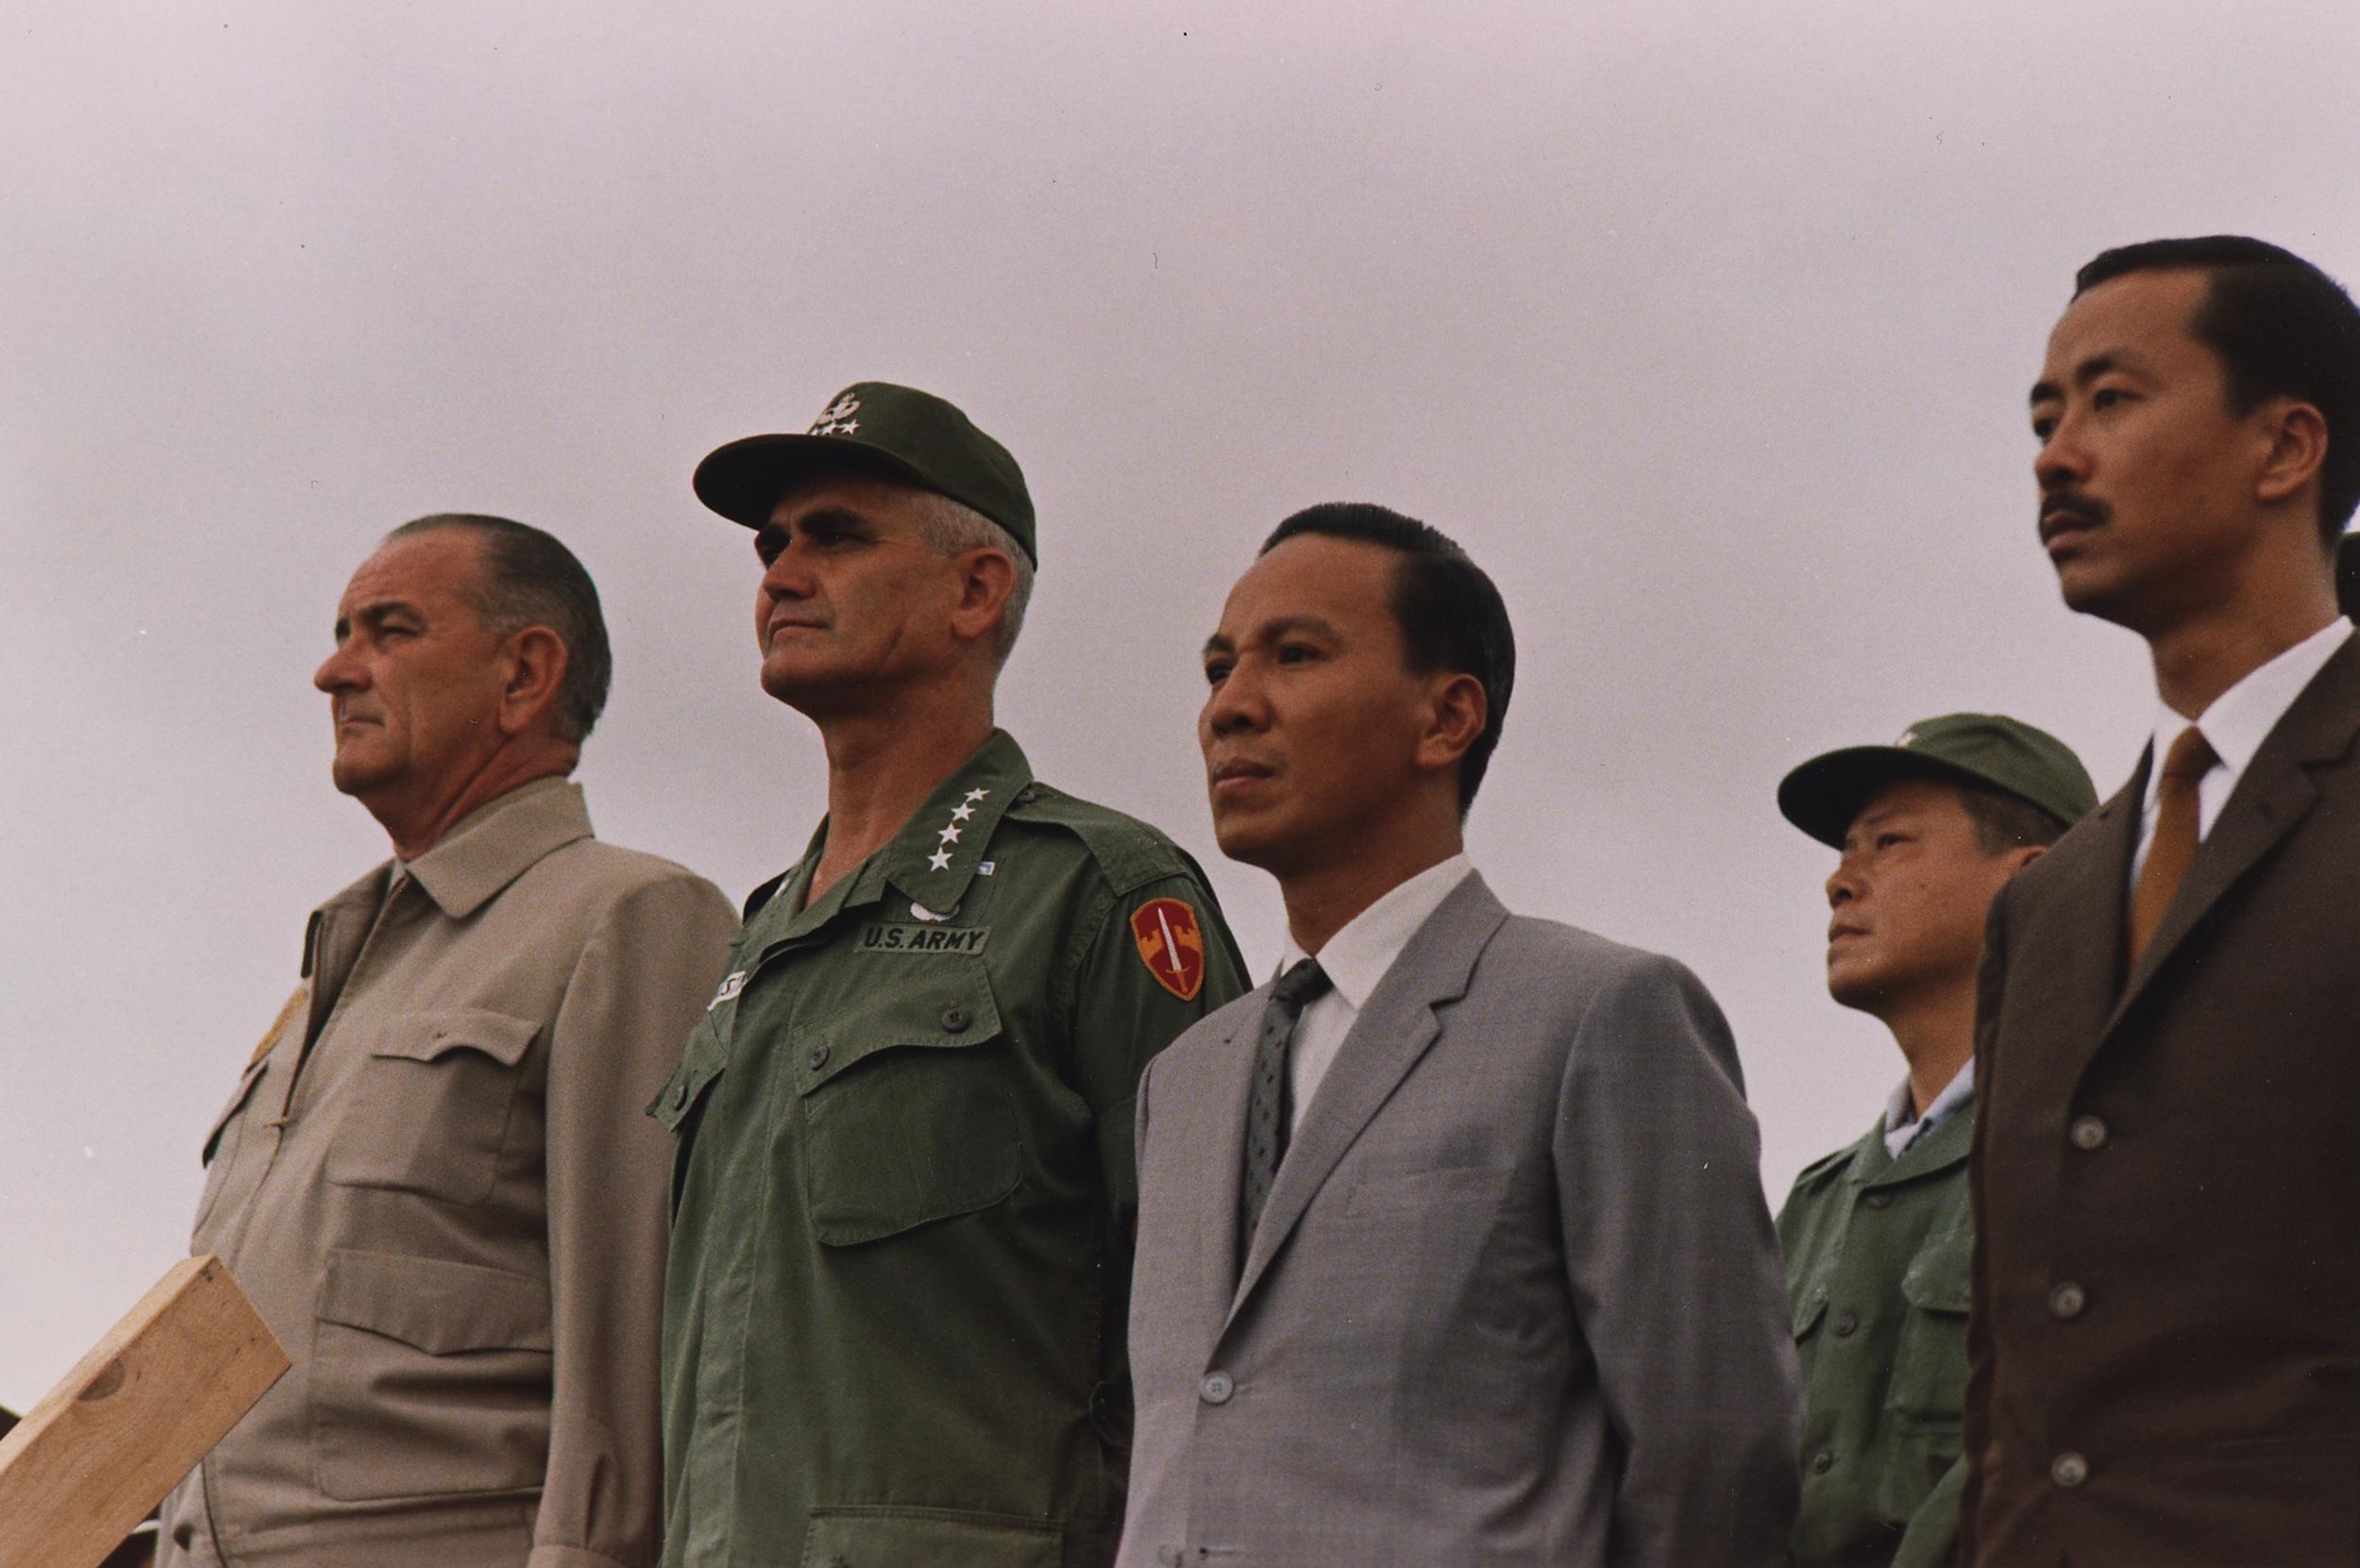 General Westmoreland, President Lyndon B. Johnson, president of South Vietnam Nguyen Van Thieu and prime minister of South Vietnam Nguyen Cao Ky in October 1966. (Yoichi Okamoto, Wikimedia Commons)